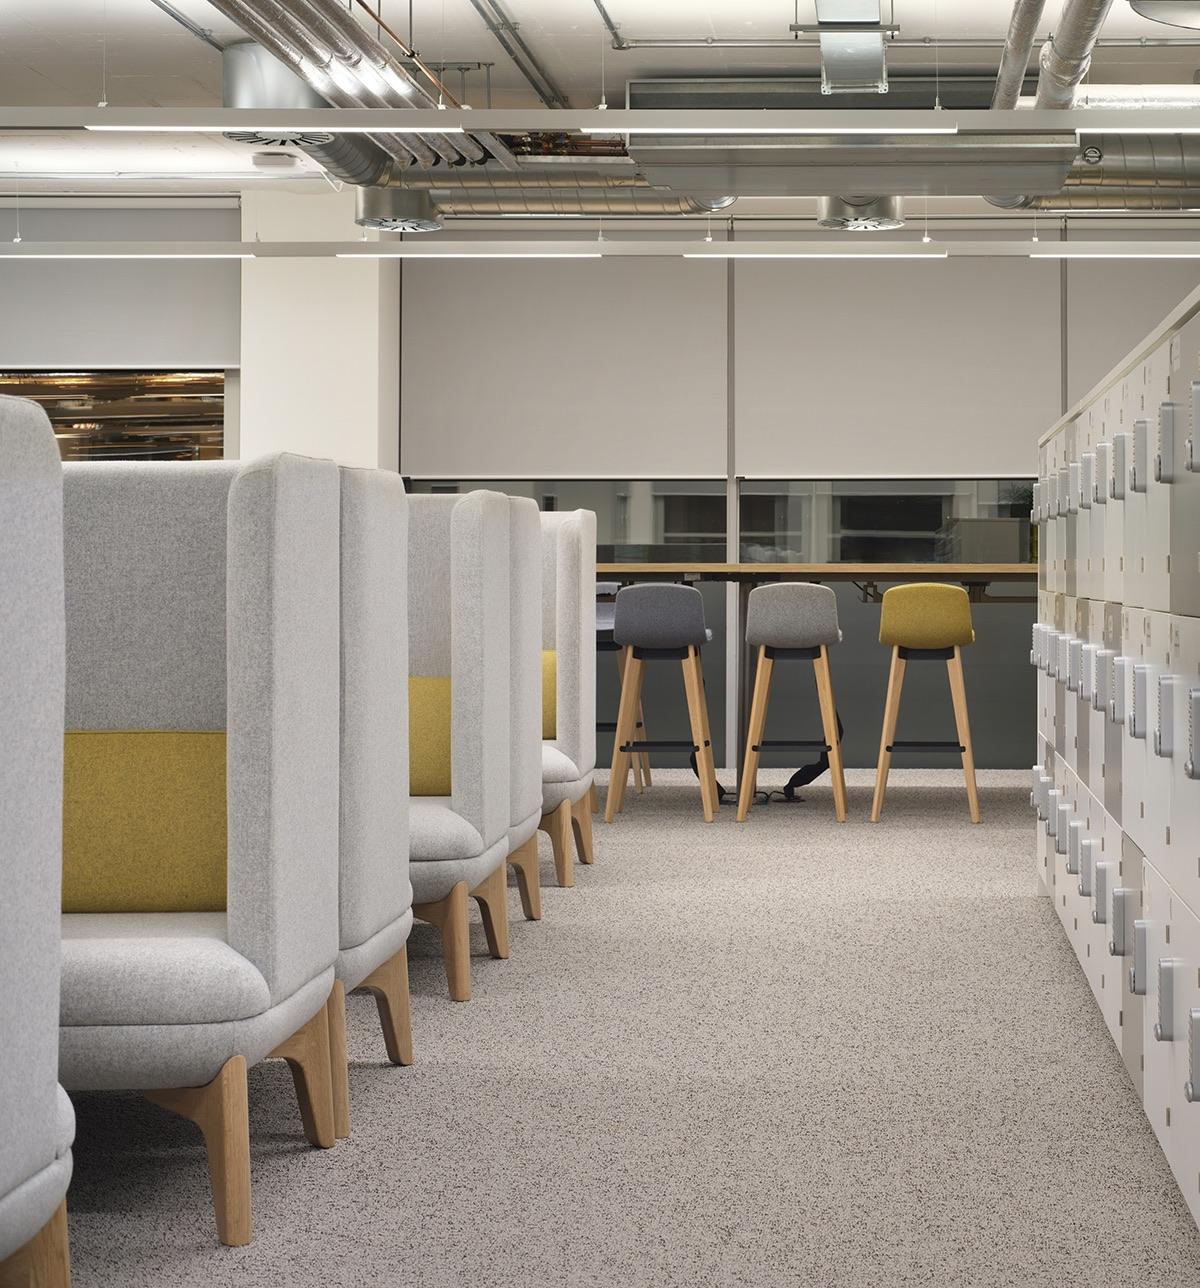 sage-publishing-london-office-12